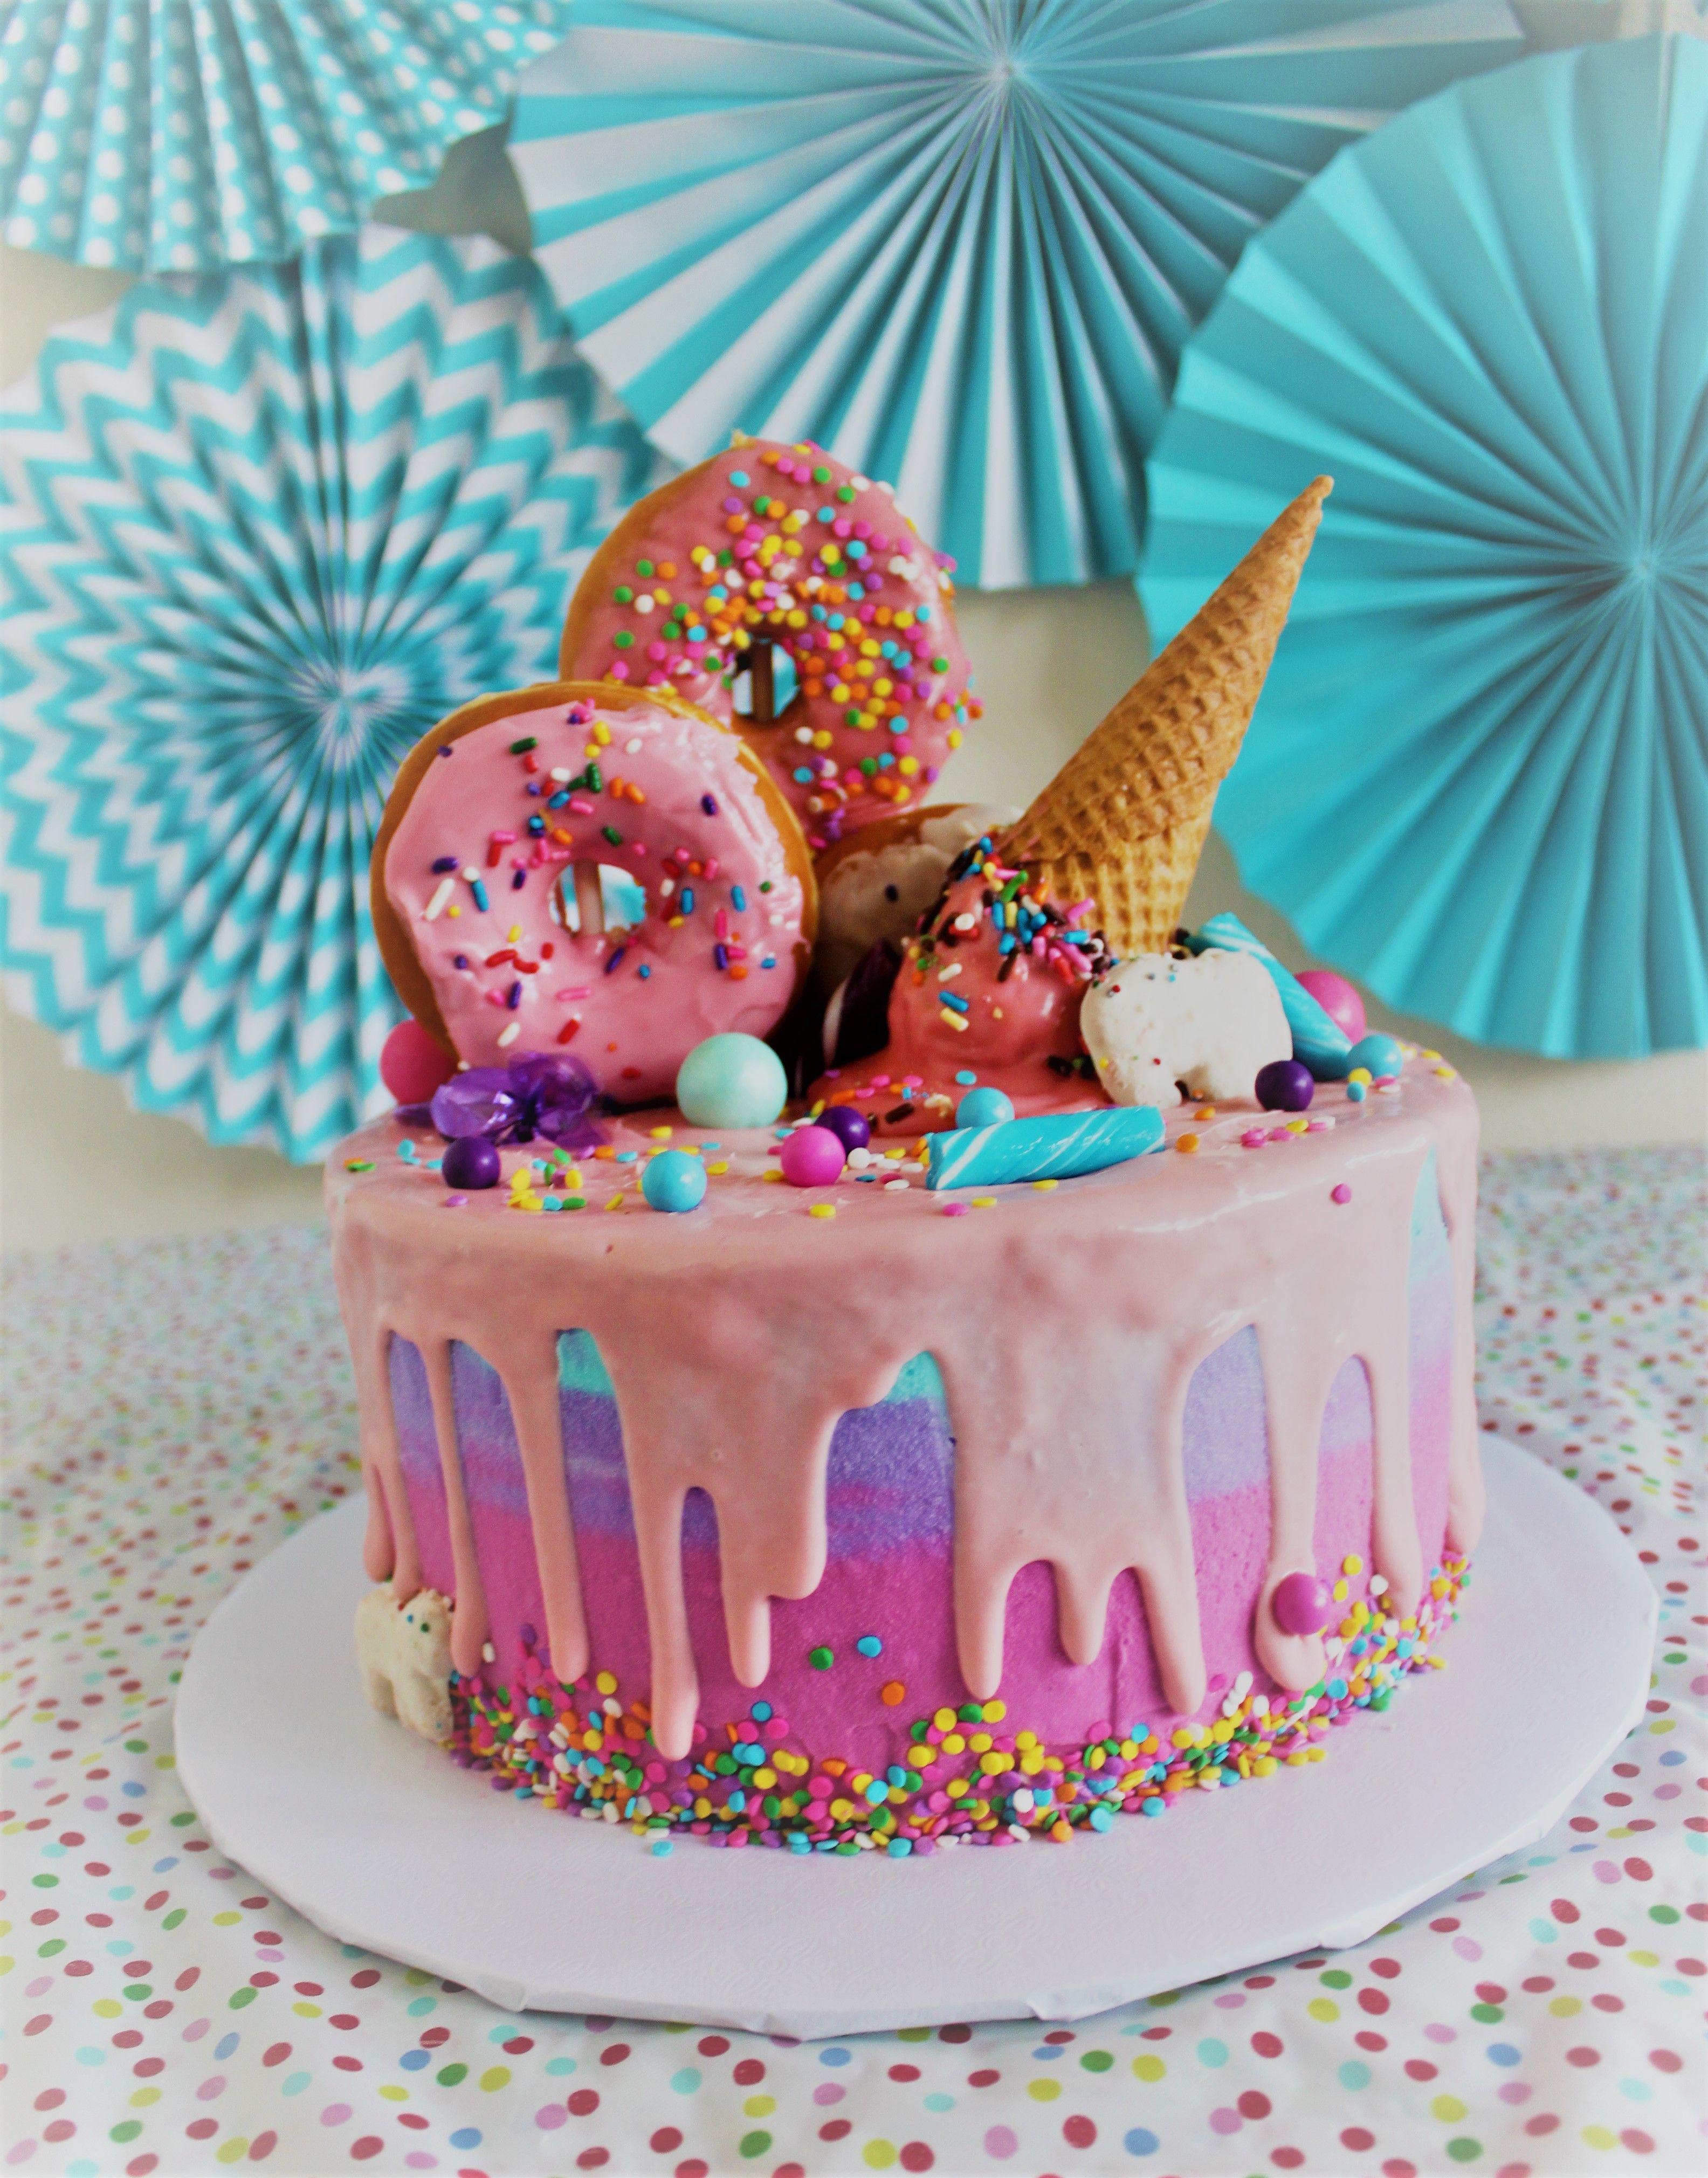 Make this fun and whimsical Salted Caramel Ice Cream Cake